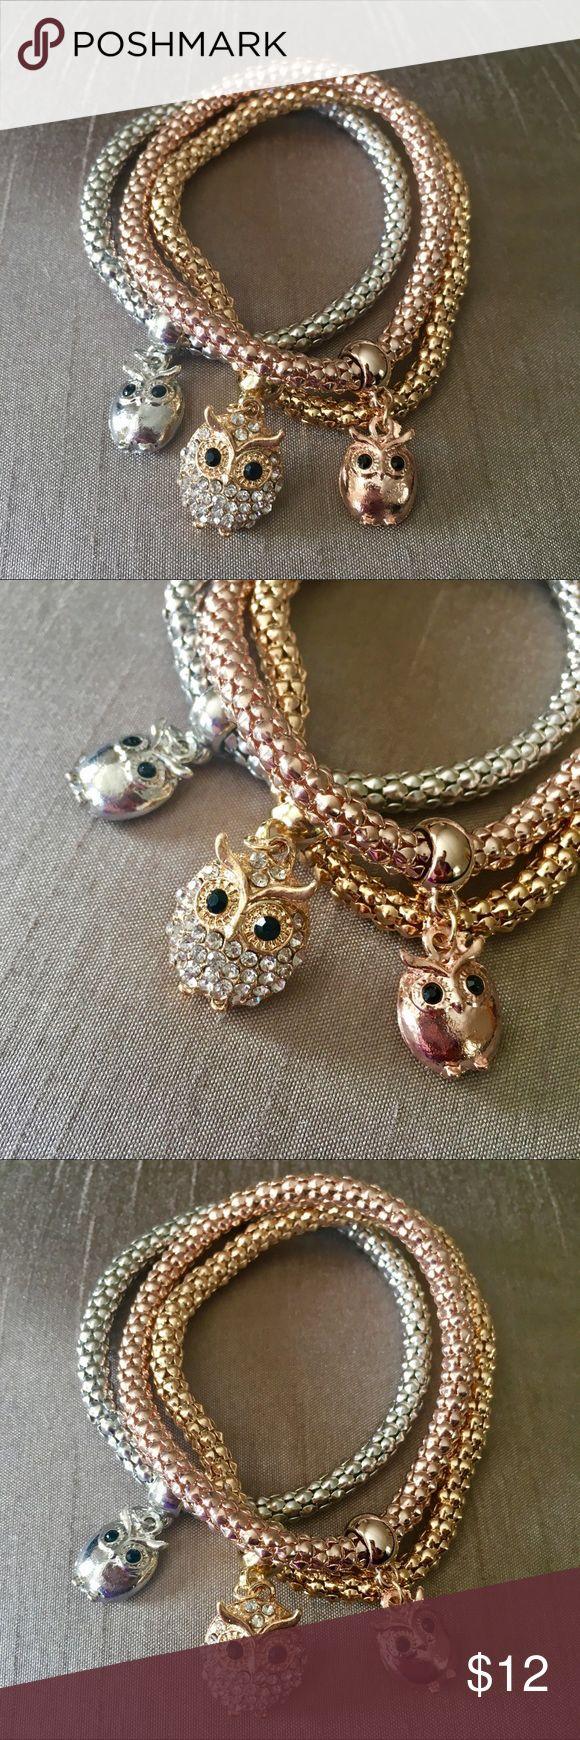 Set Of 3 Owl Charm Multi Metal Stretch Bracelets Boutique